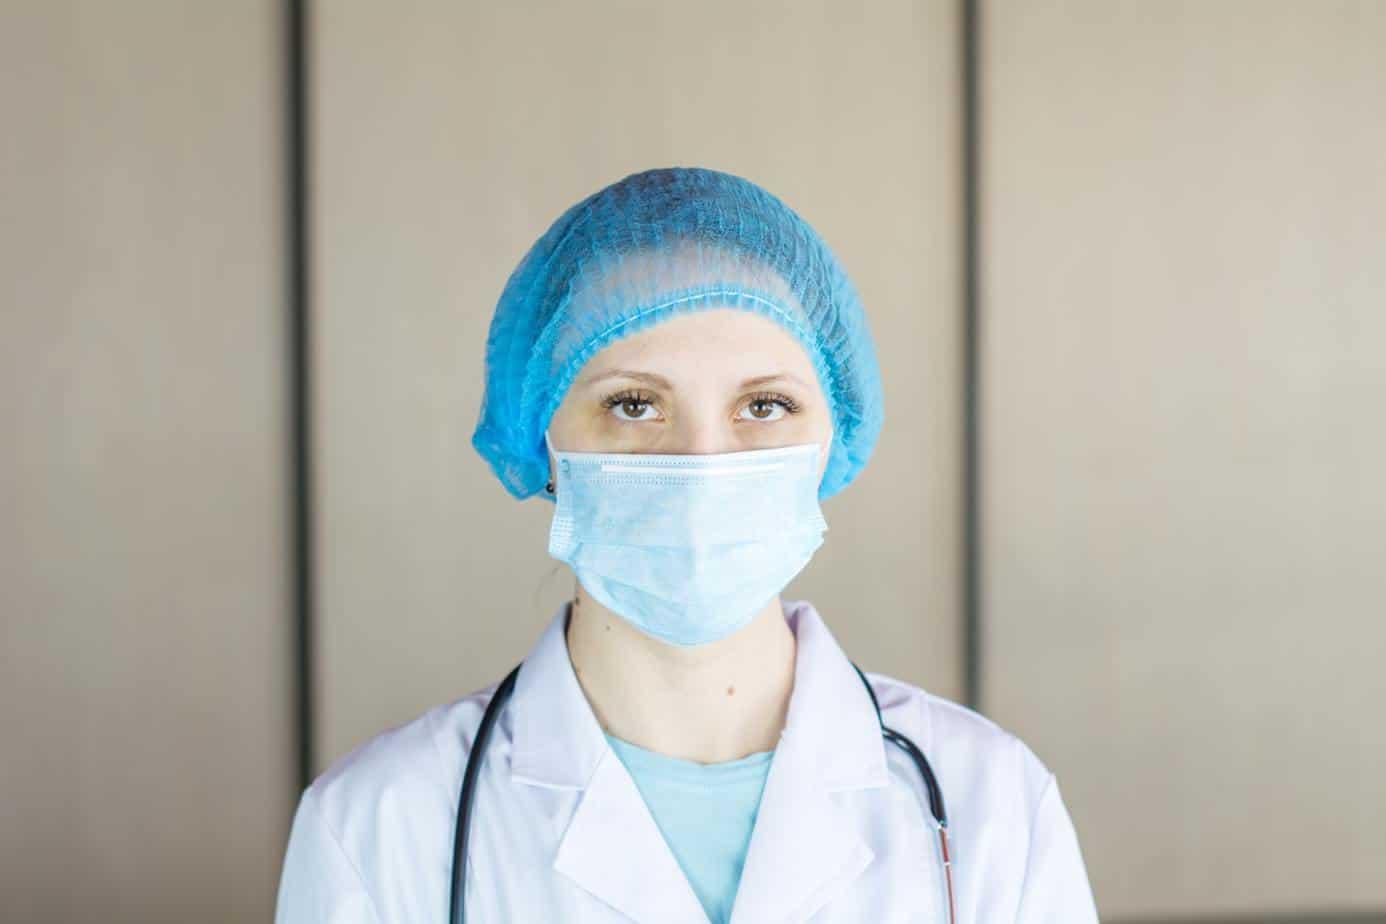 gastroenterologist surgical cap